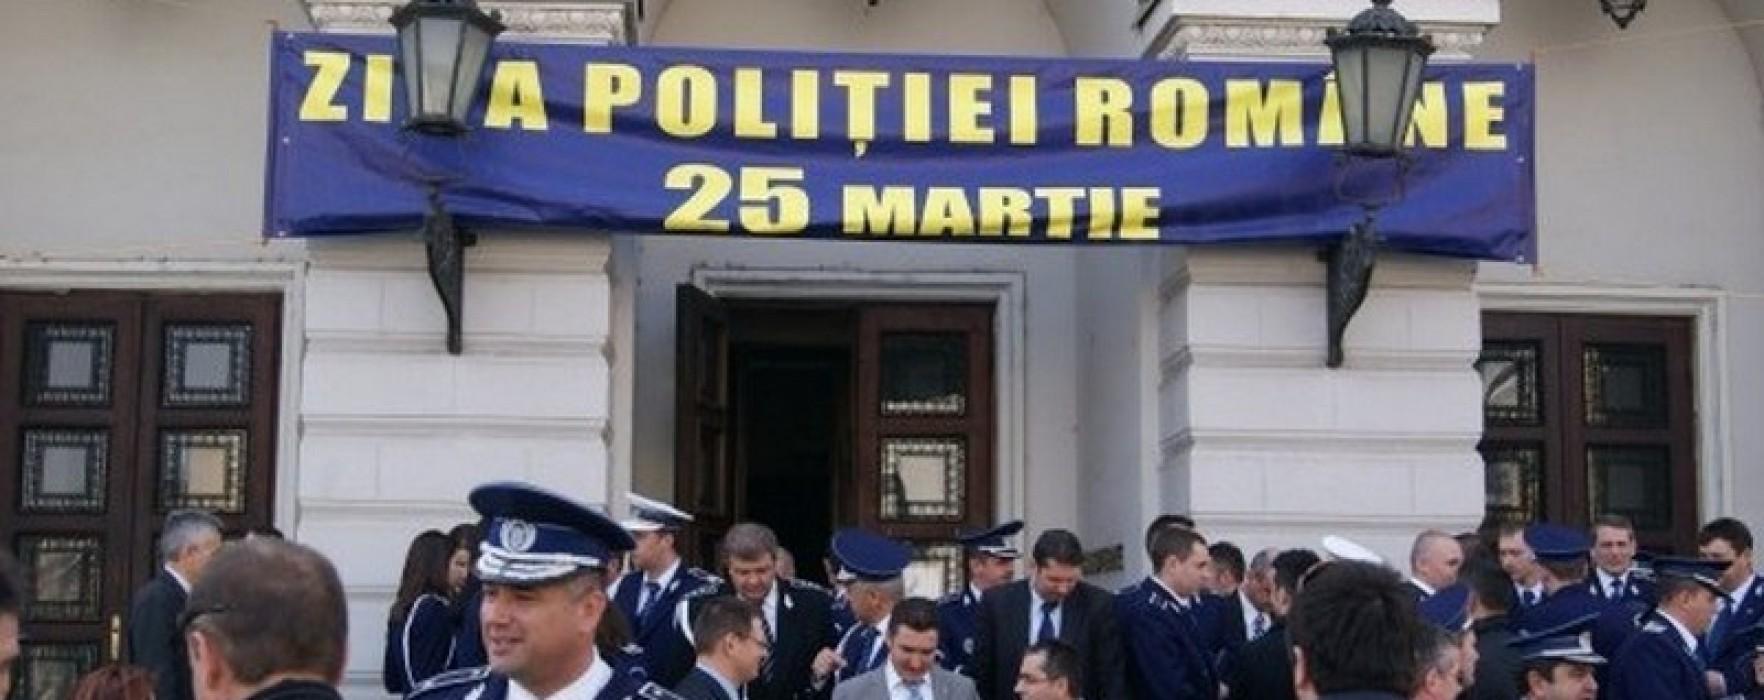 Ziua Poliției Române